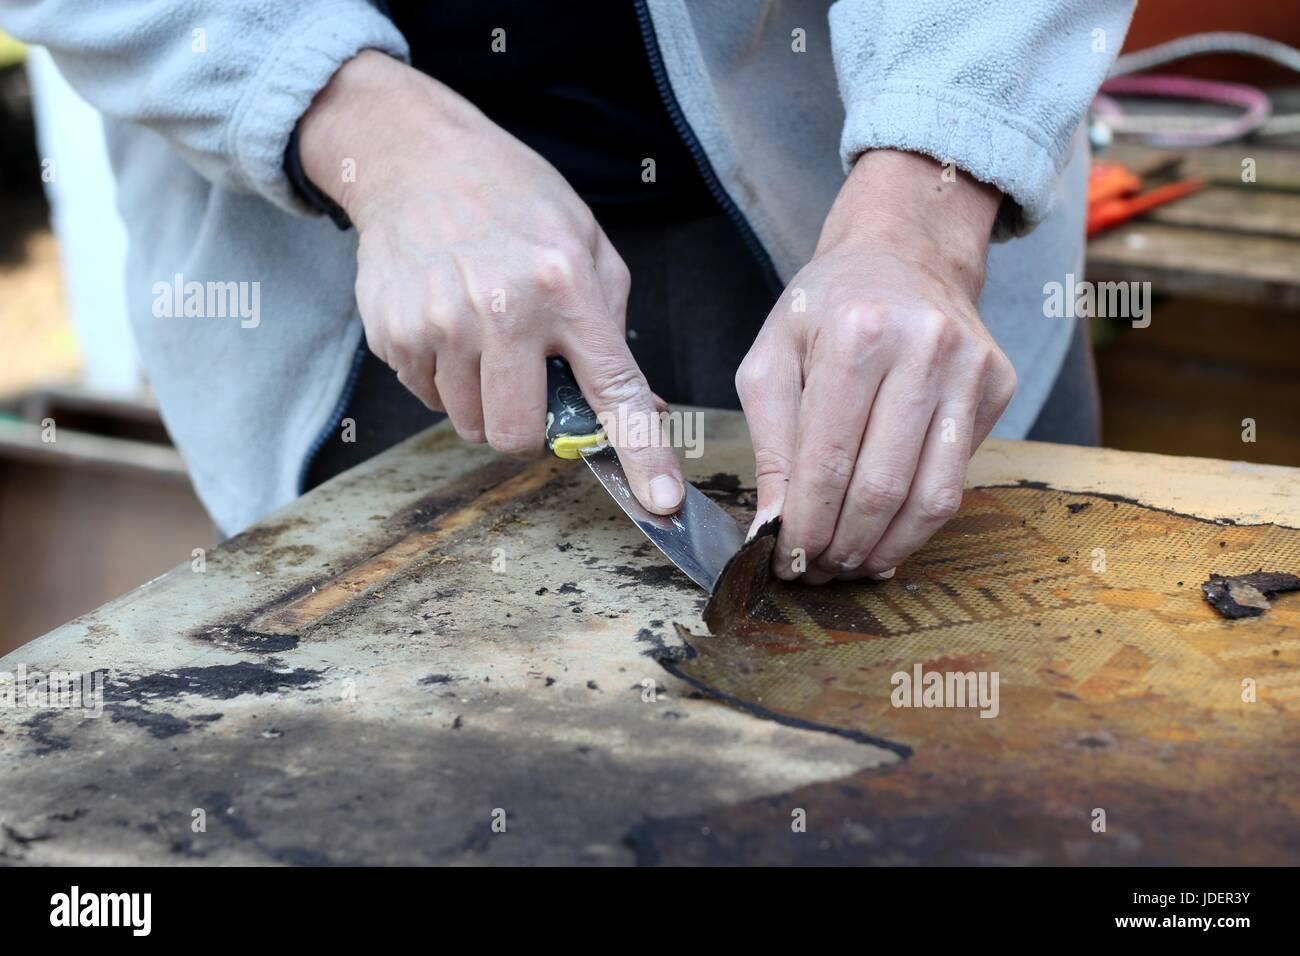 furniture restoration - Stock Image